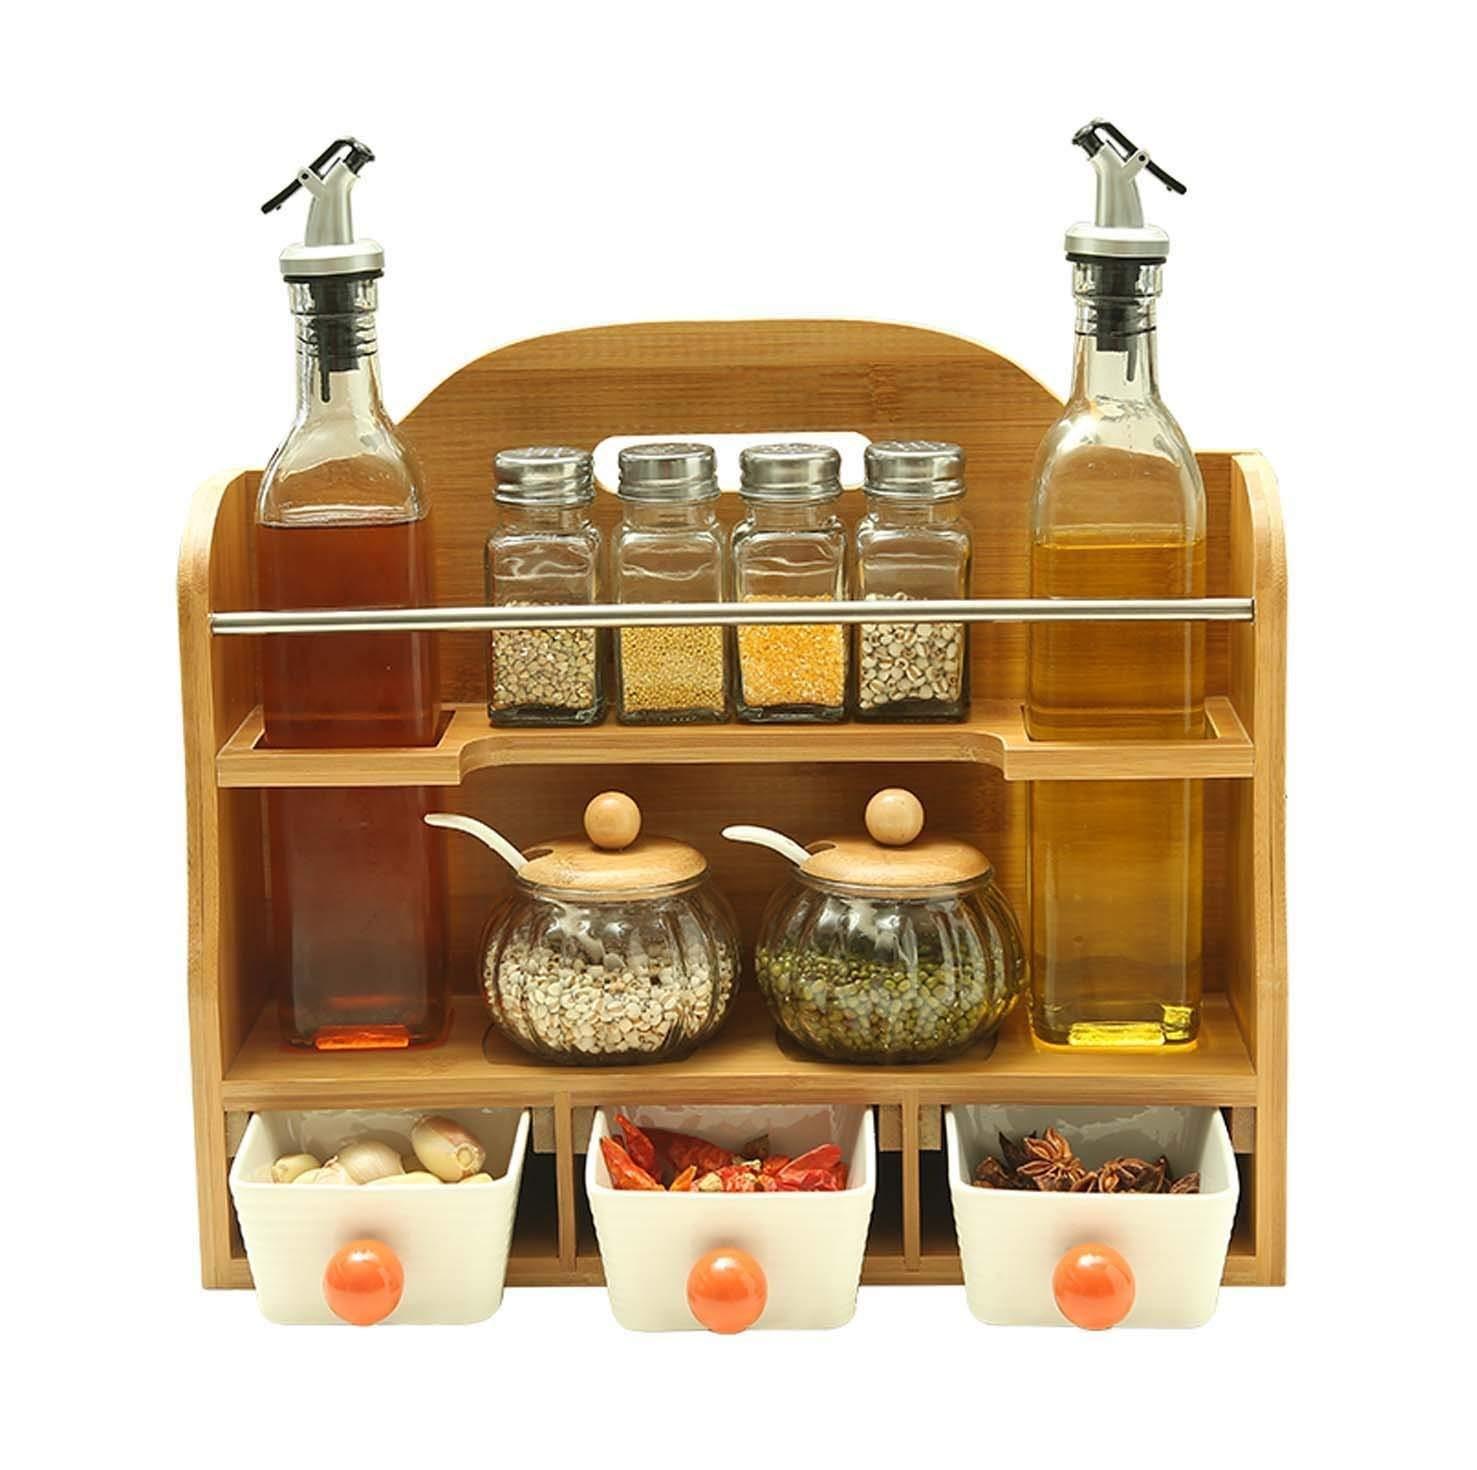 HLL Seasoning Bottle Kitchen Supplies, Glass Condiment Bottles, Stainless Steel European Anti-Leak Oil Pot, Oil Vinegar Pot Sets (12 Assembled)